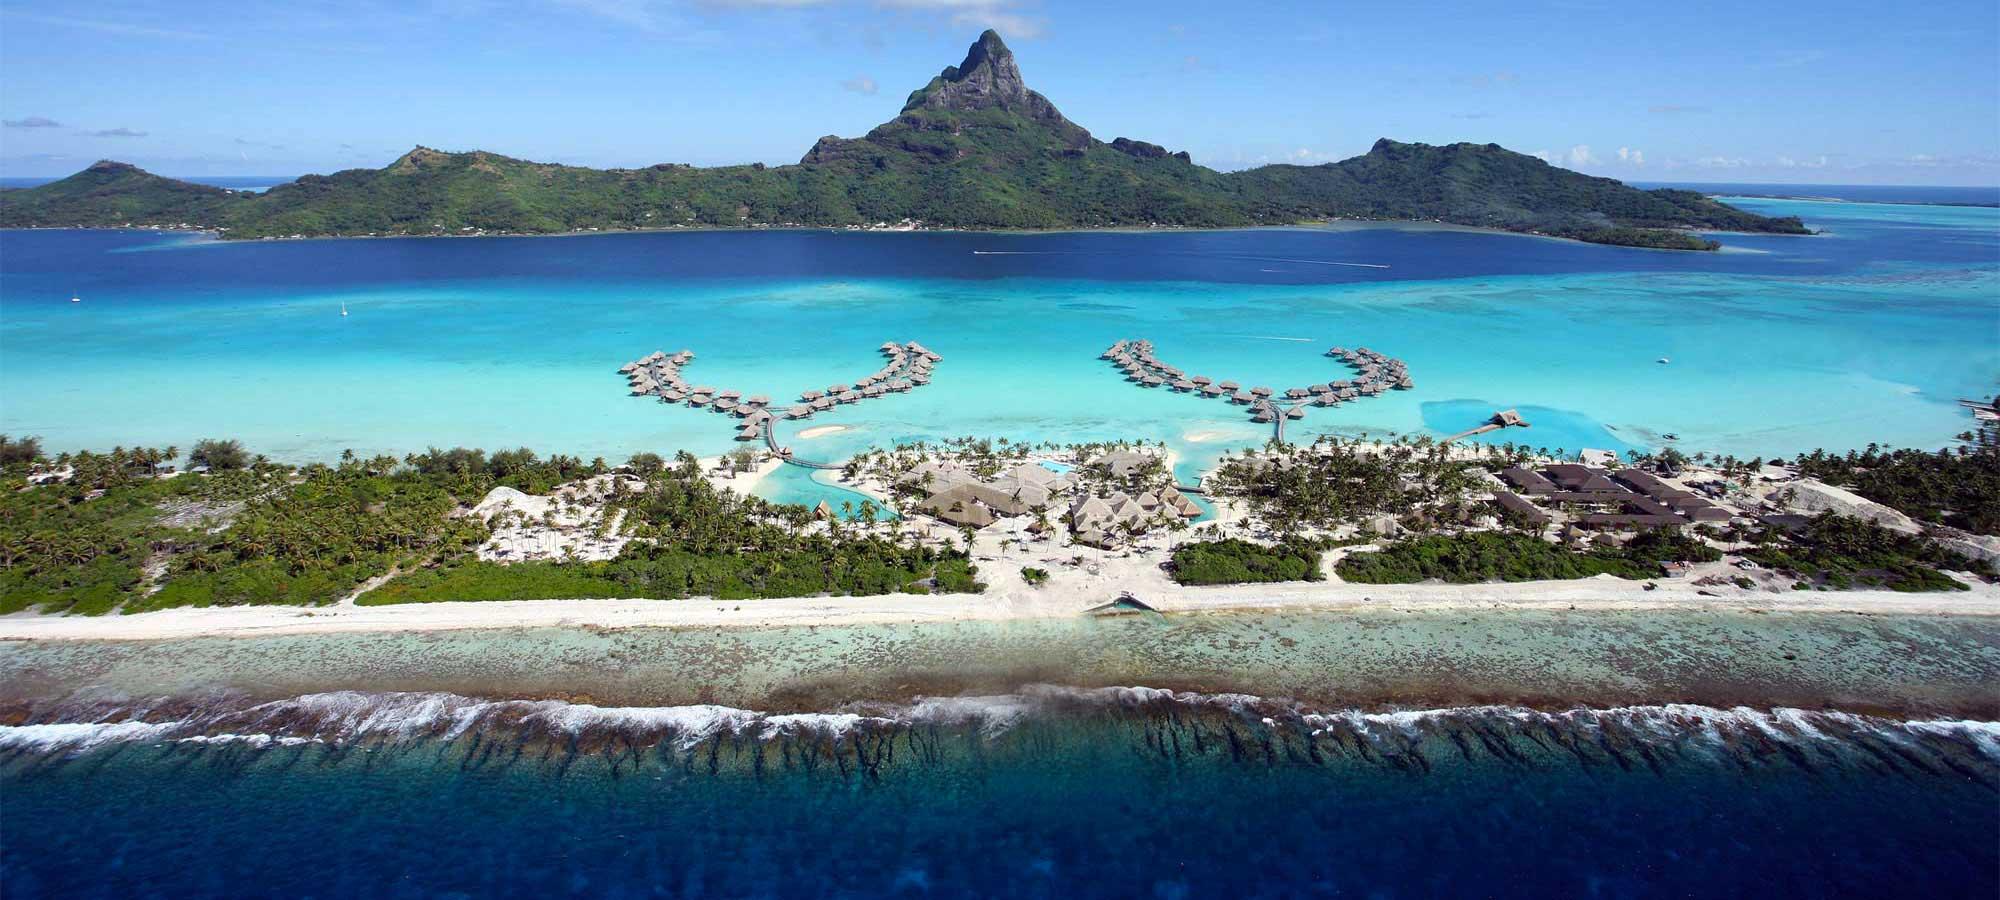 Tahiti franz sisch polynesien urlaub reisen hotels tahiti bora bora moorea - Rangiroa urlaub ...